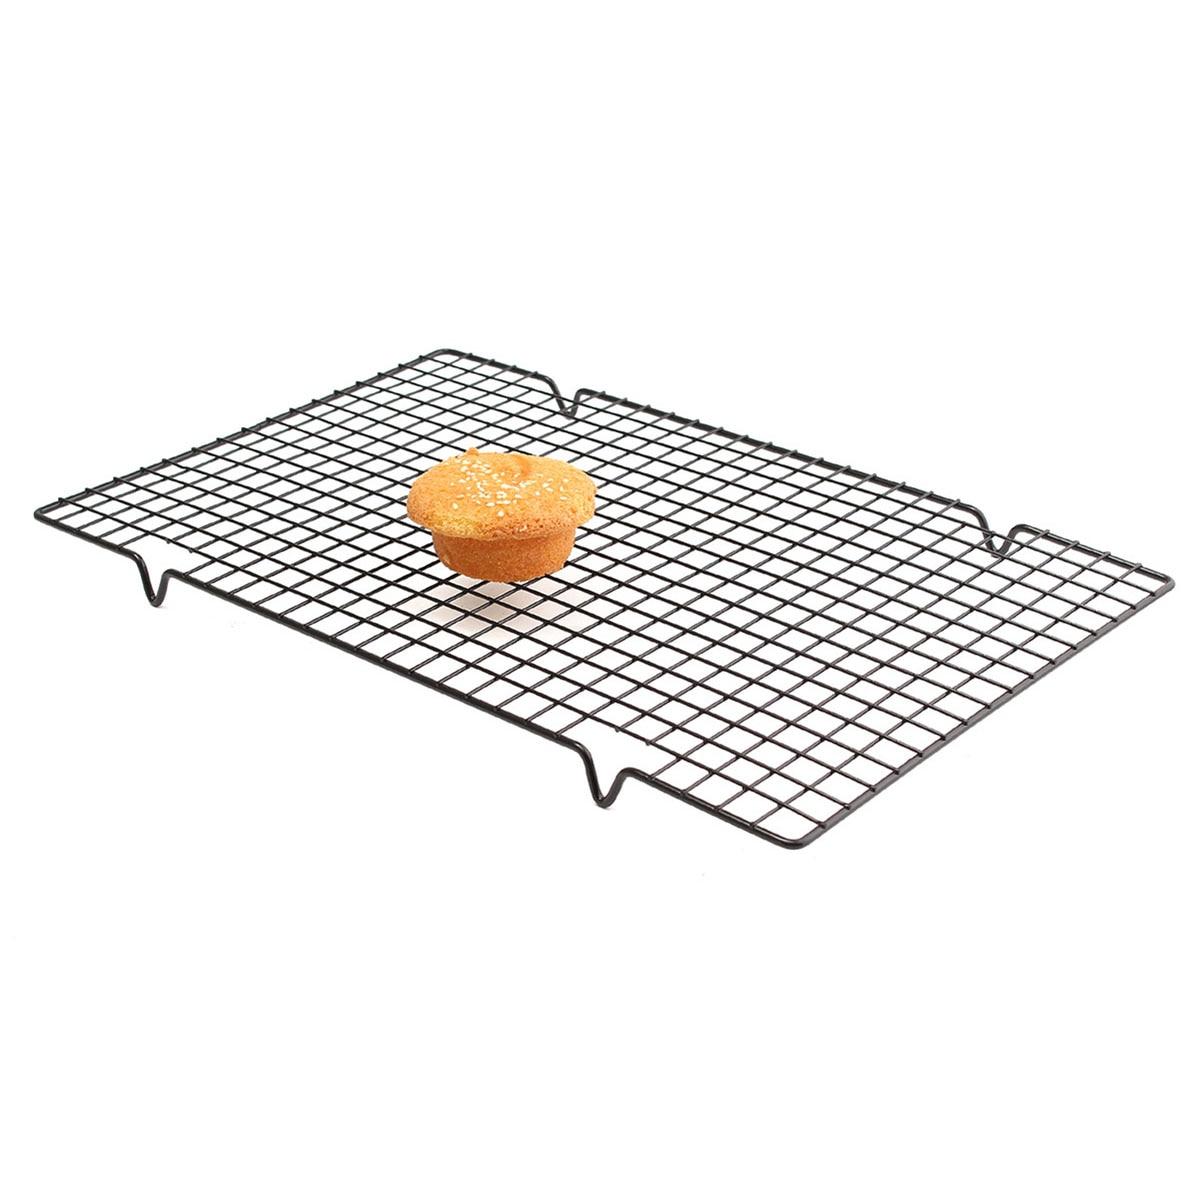 25x40CM Stainless Steel Cooling Rack Mesh Grid Baking Cookie Biscuit ...